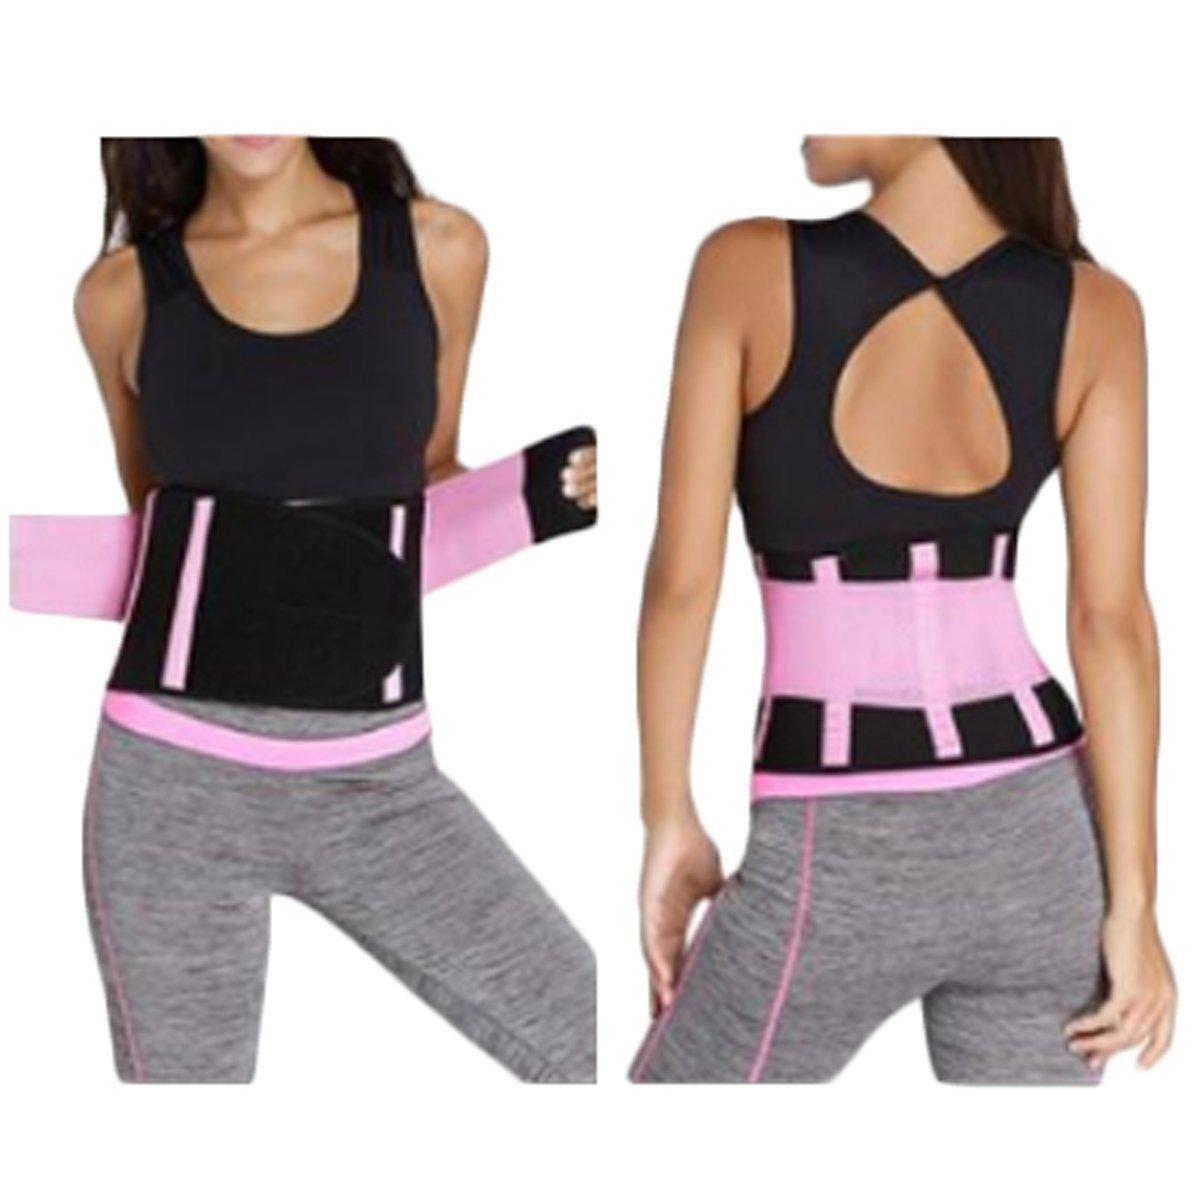 Diconna Postpartum Women's Waist Trainer Belt Tummy Control Bodyshaper Corset Cincher